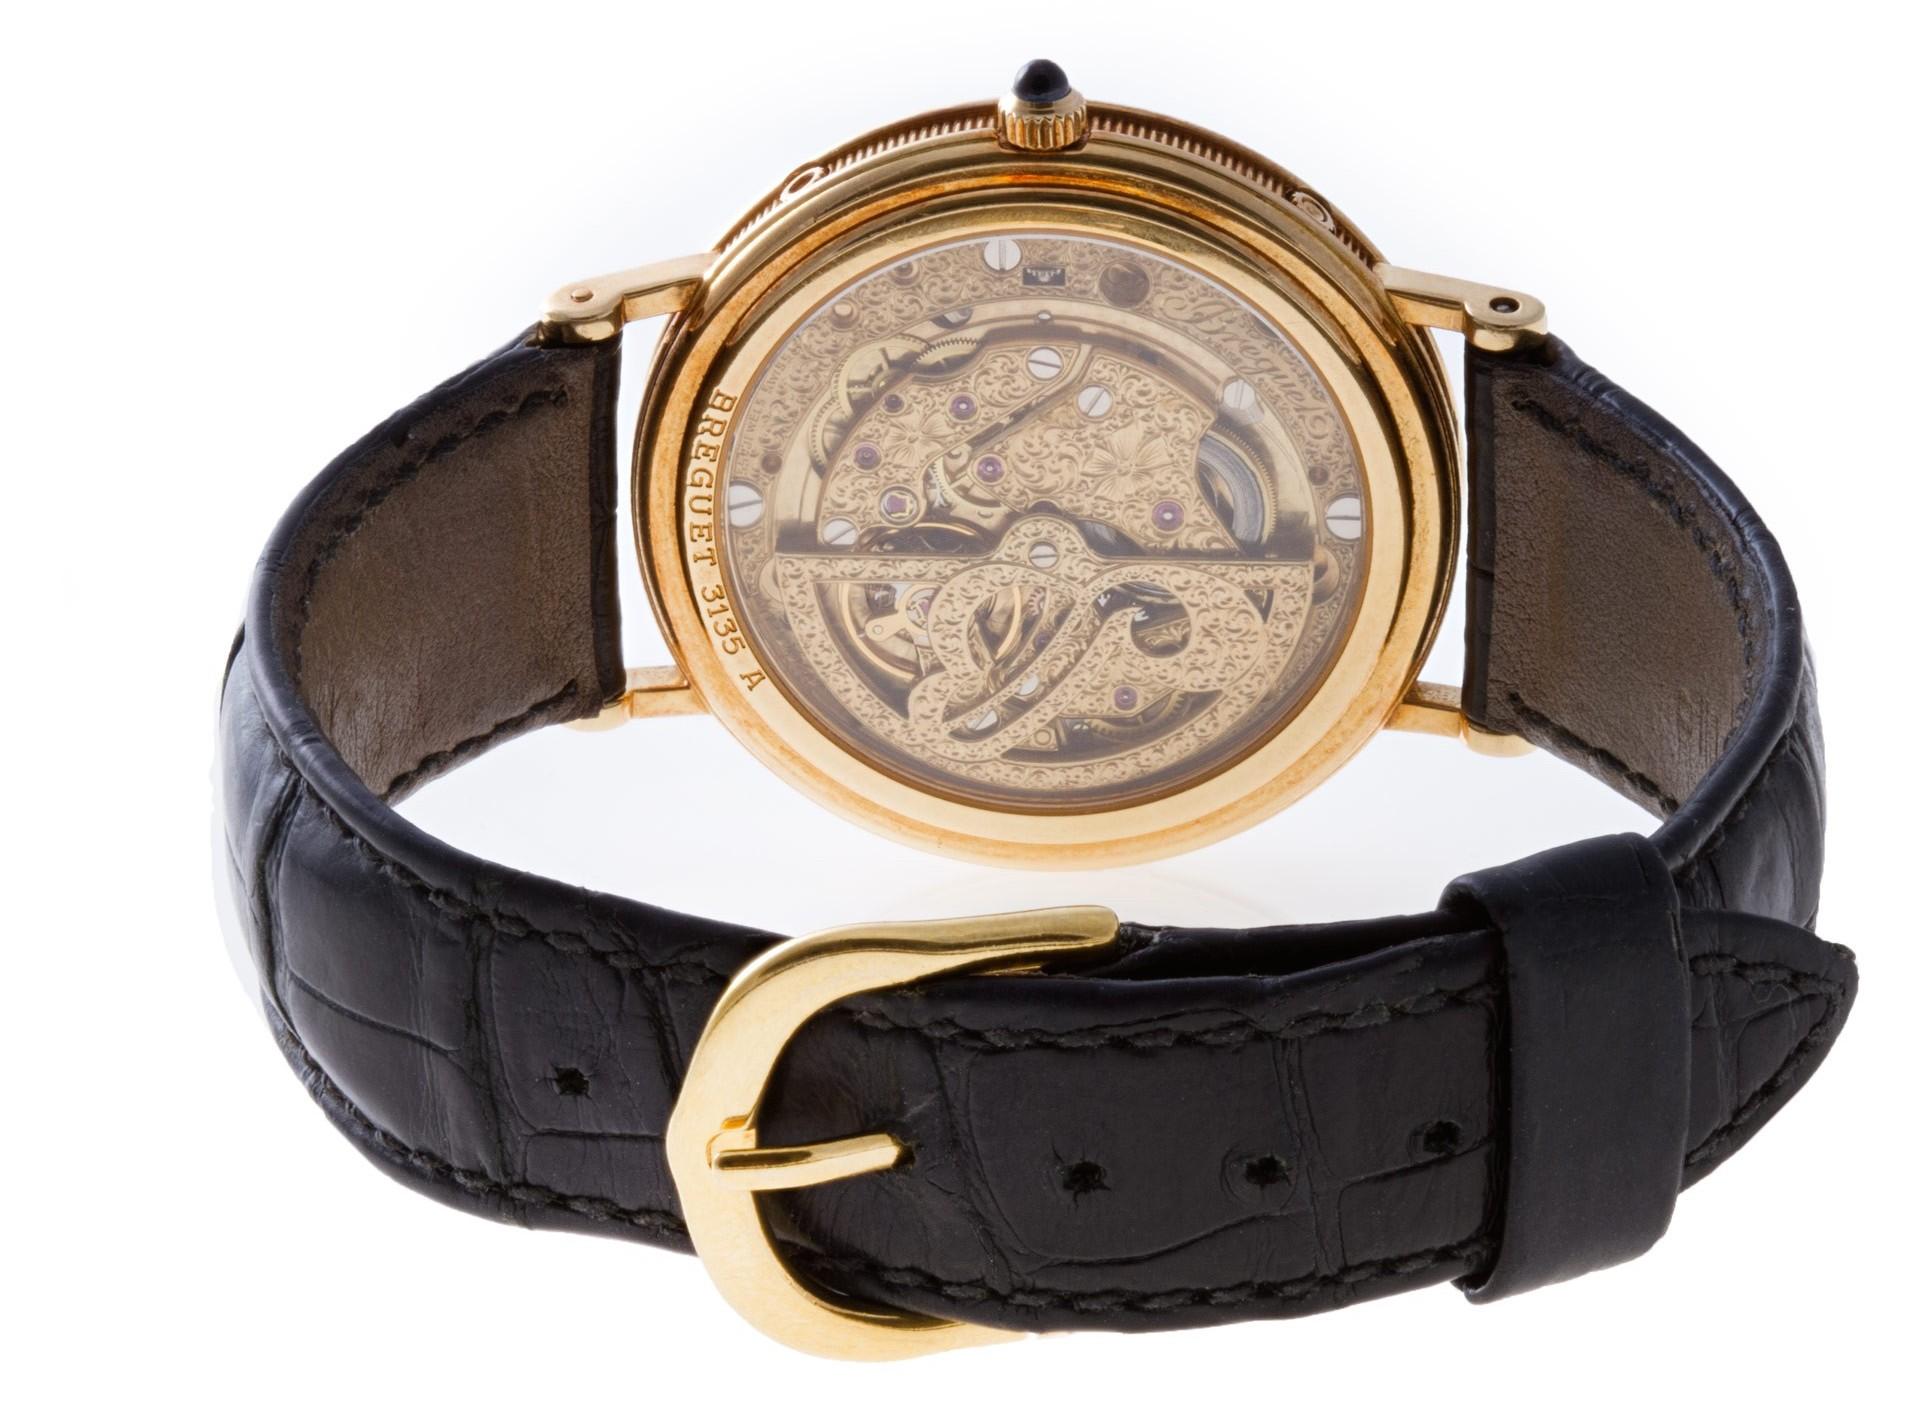 Breguet Watches: Classique 3337